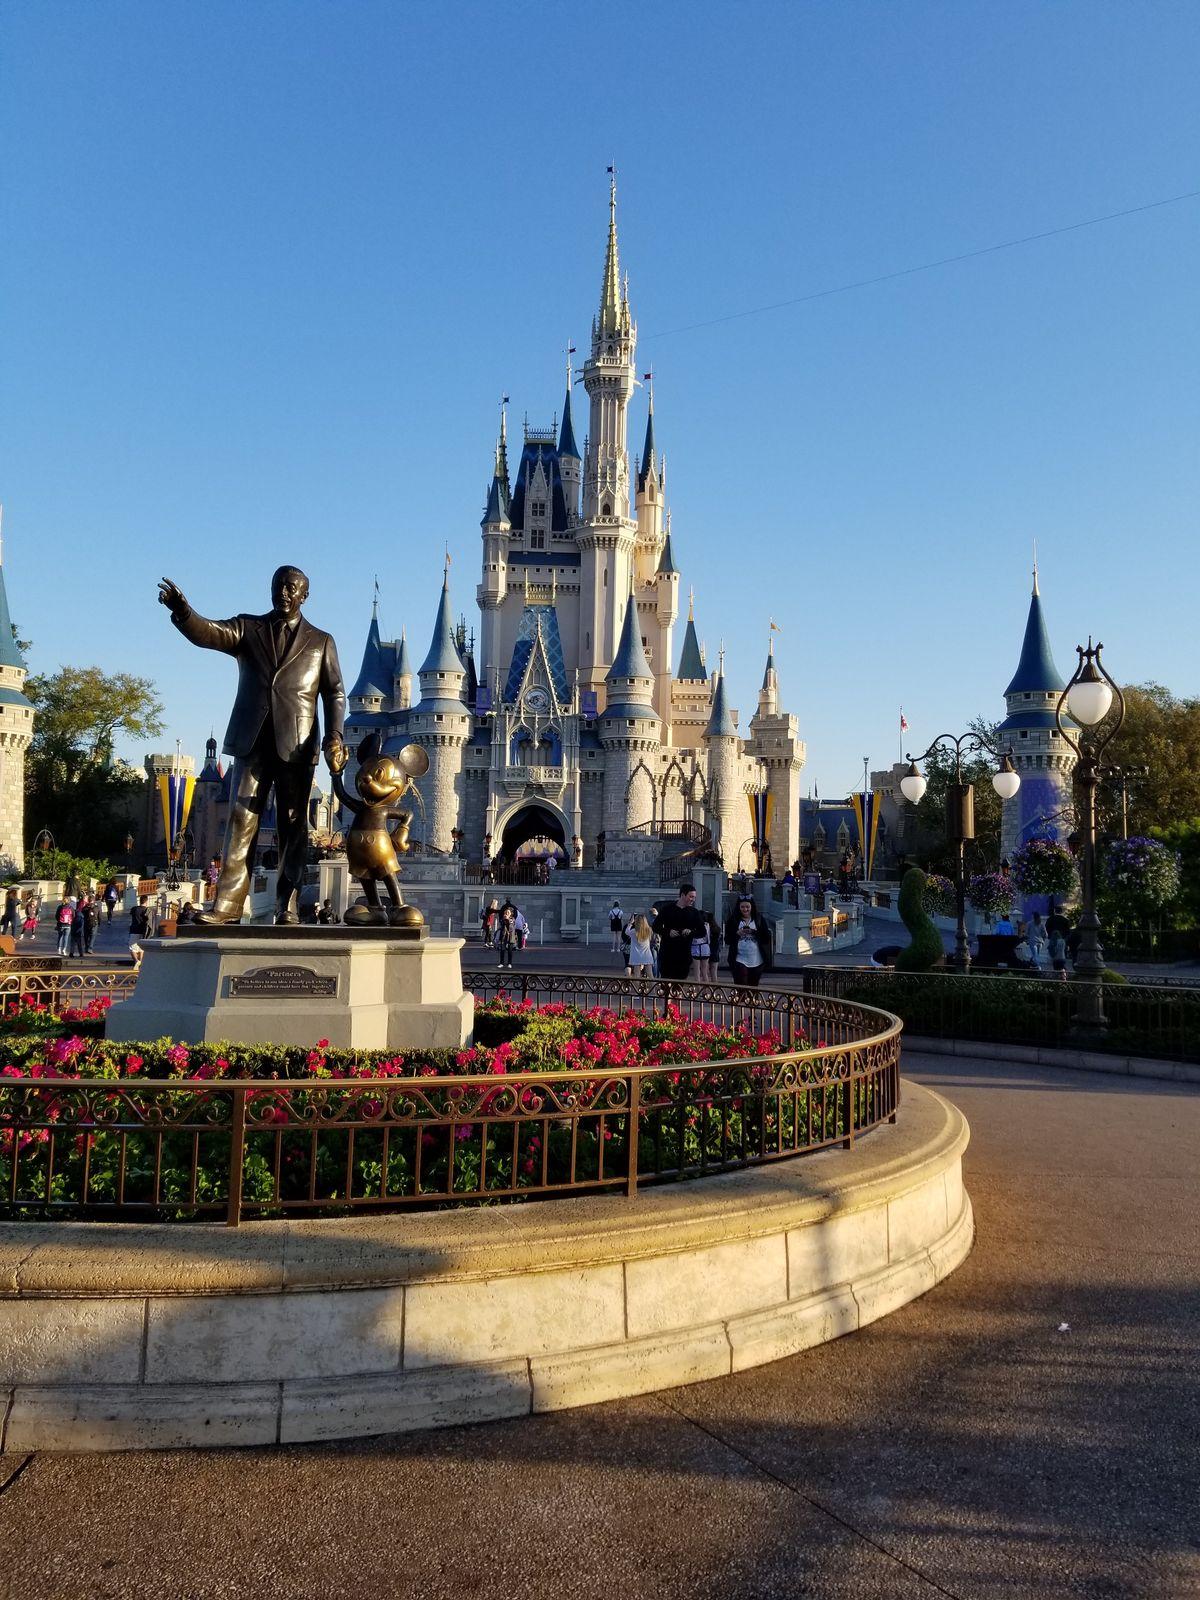 My Experience Of Losing My Car Rental Keys At Disney's Magic Kingdom